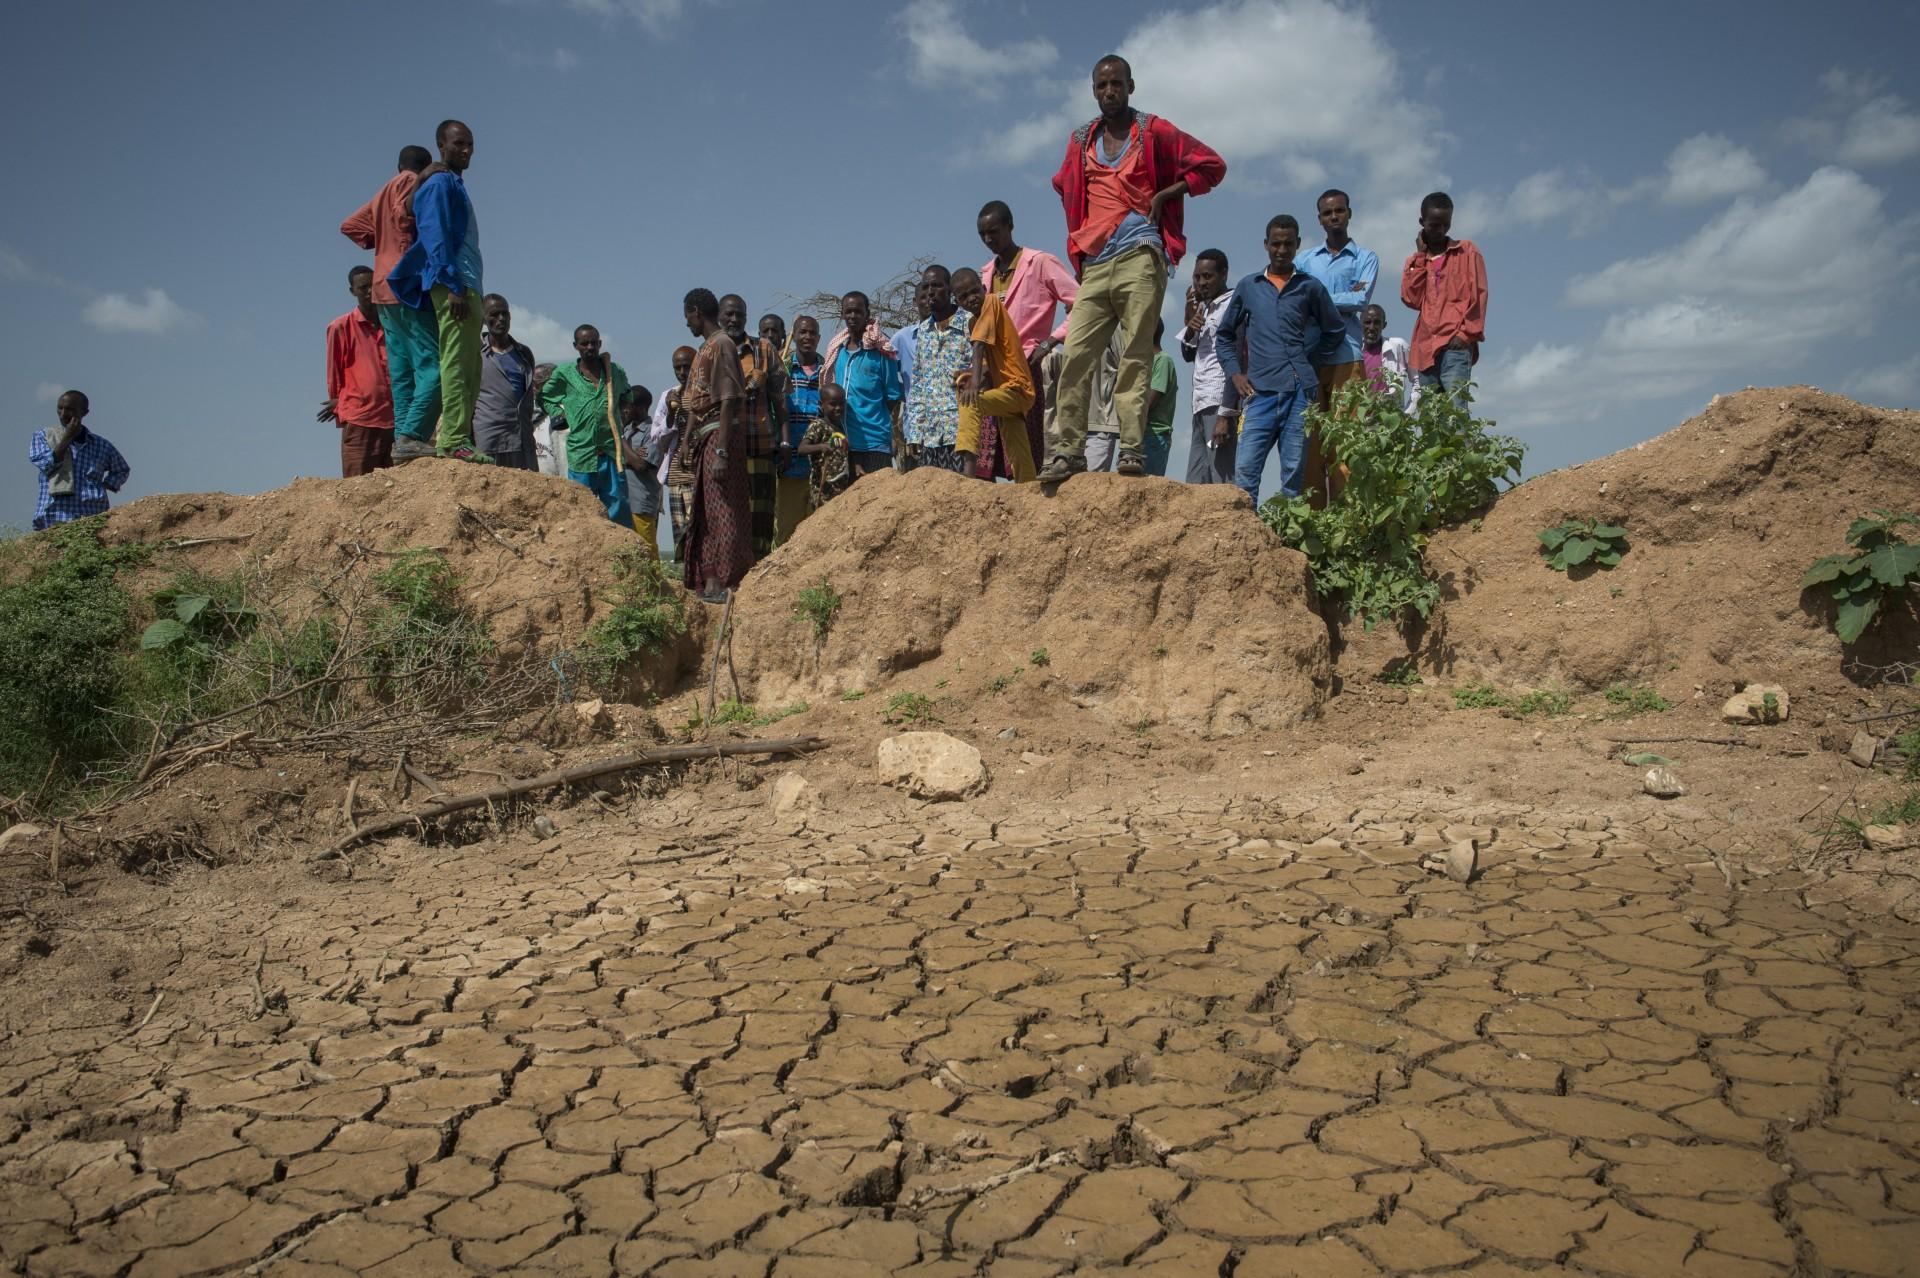 Klimaendringer rammer de fattigste hardest